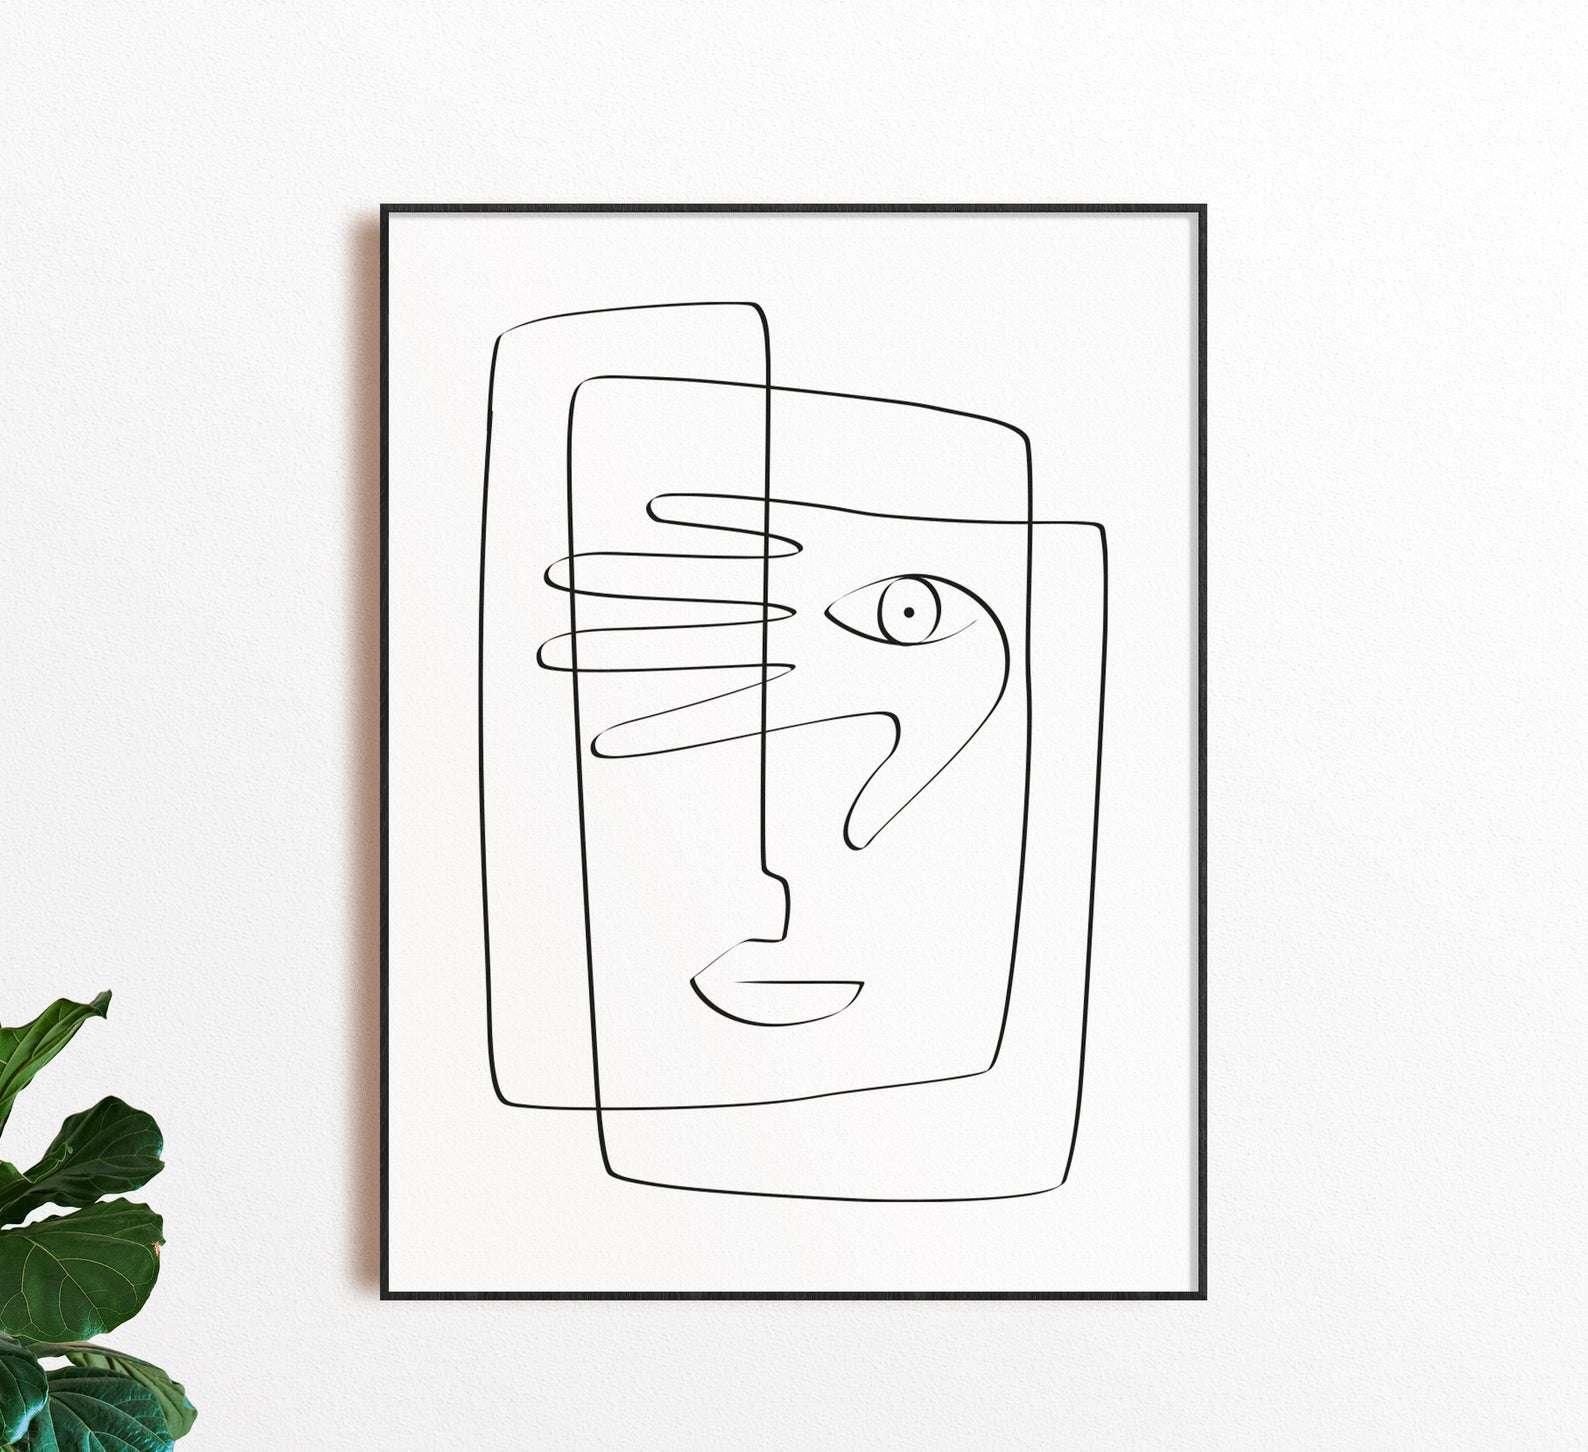 TinteriaDesign One Line Art Print